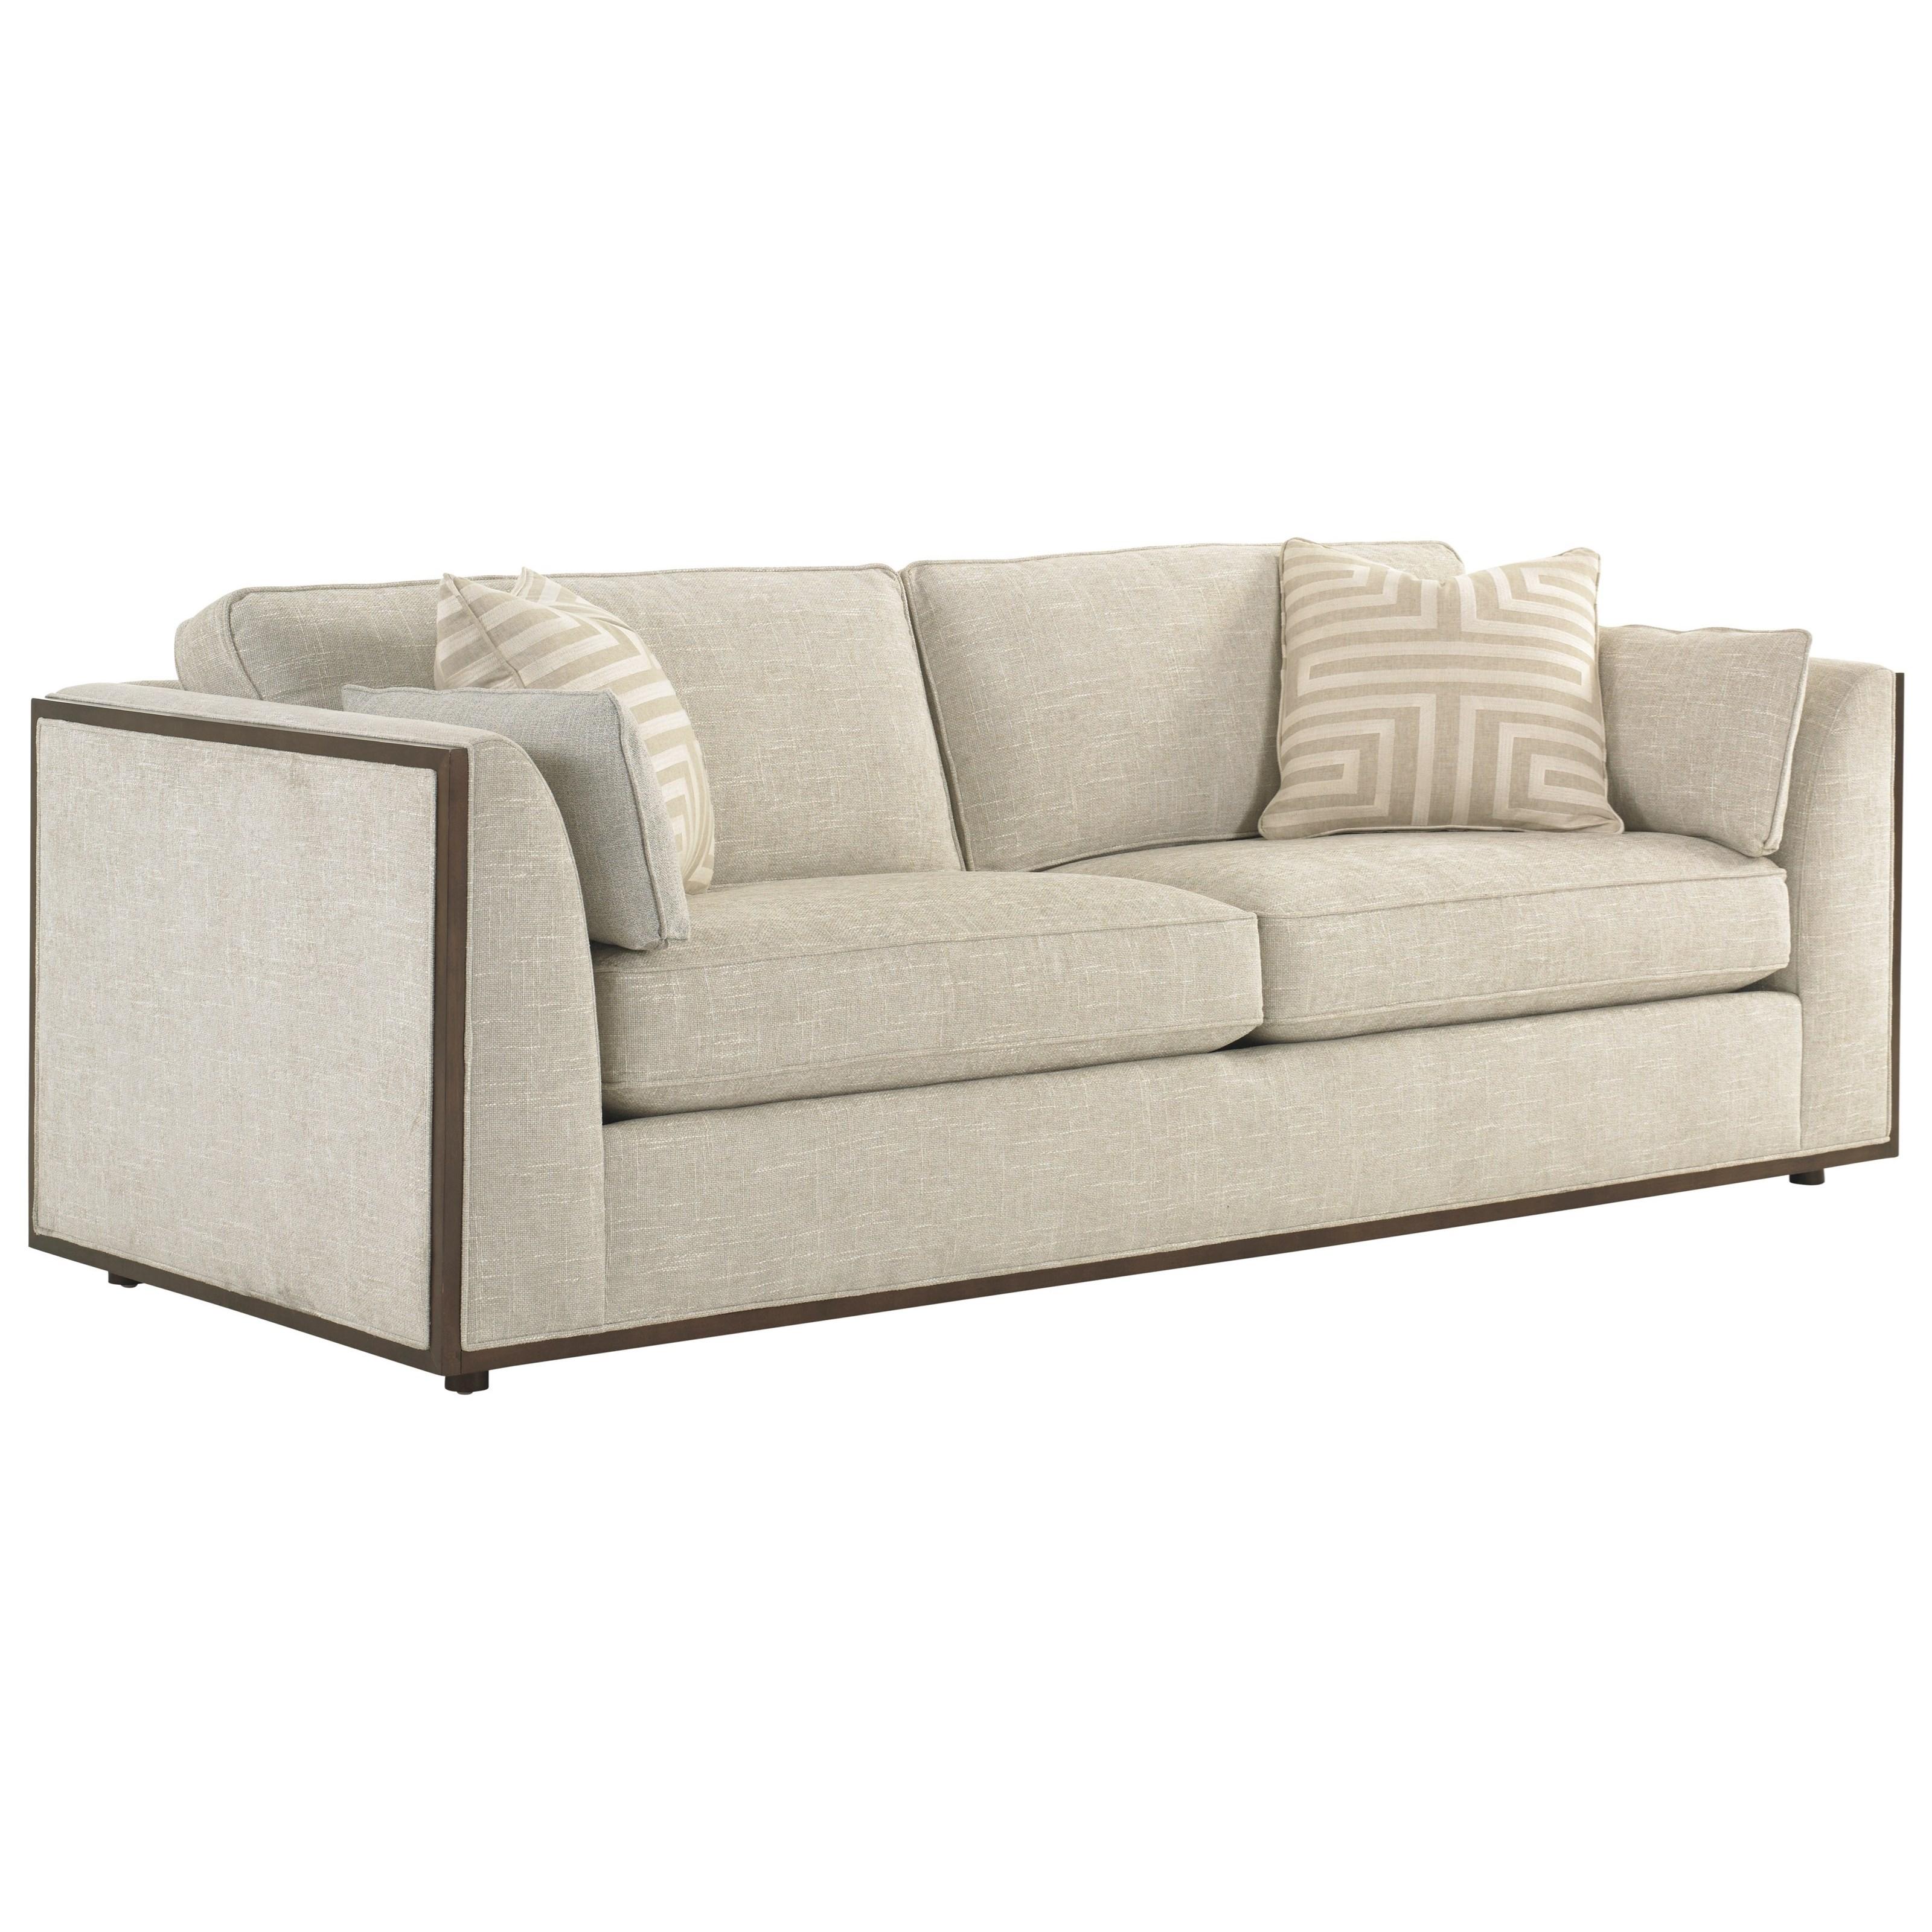 MacArthur Park Westcliffe Sofa by Lexington at Baer's Furniture